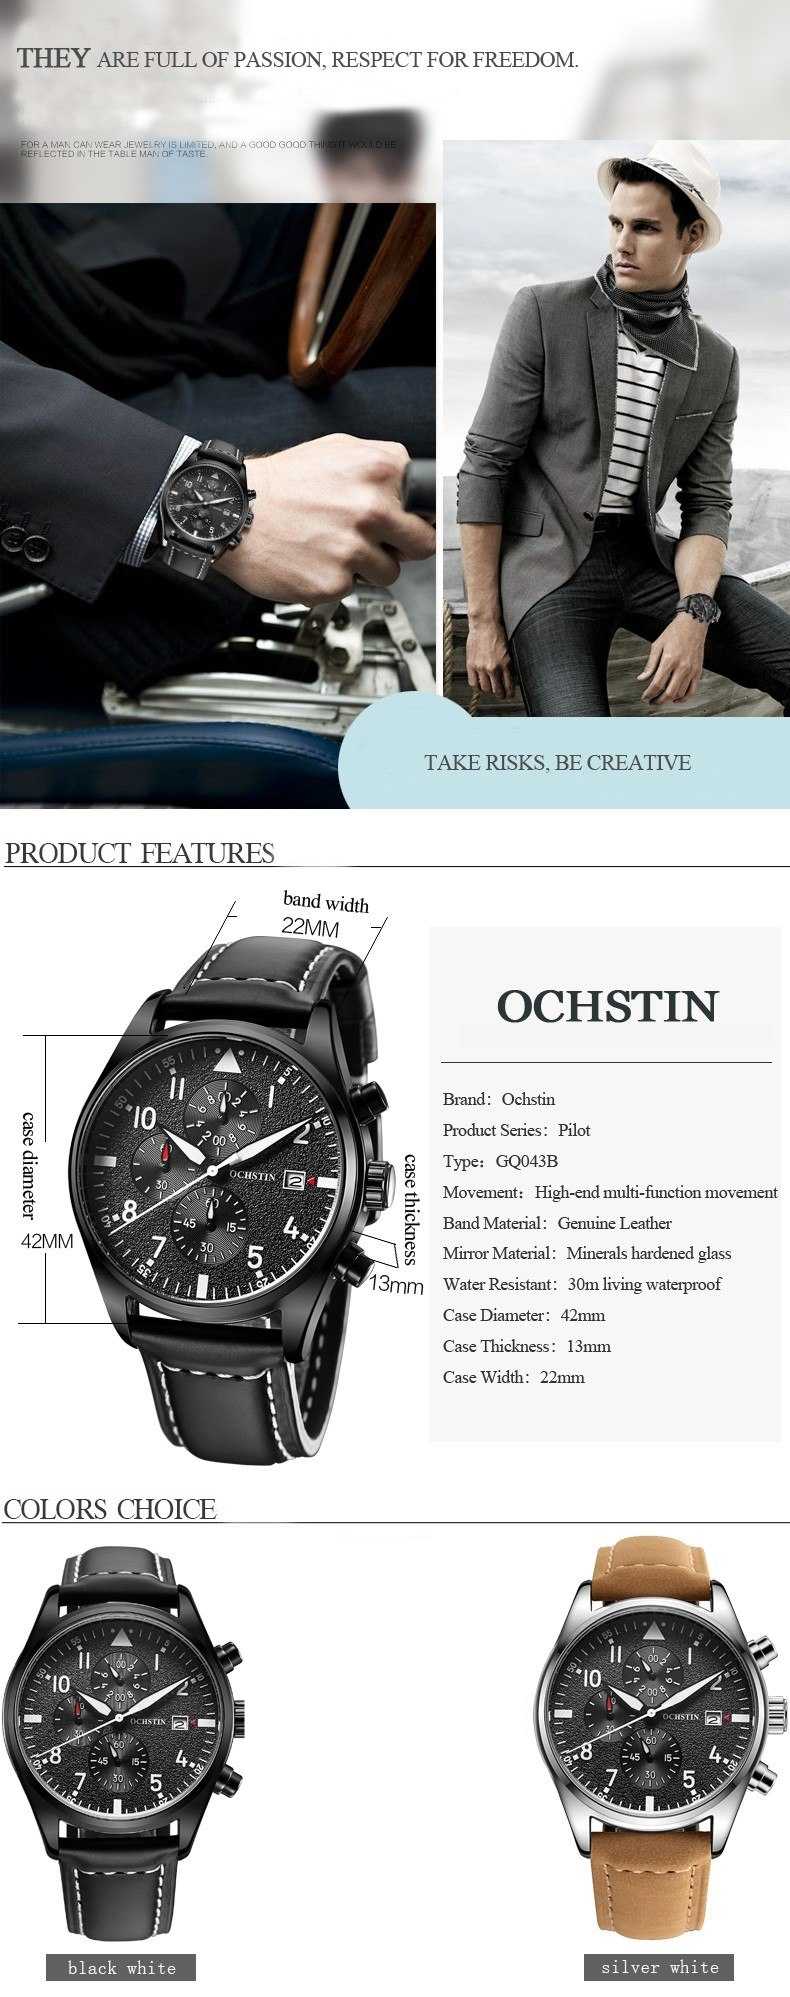 Zegarek Ochstin Infinity Czarny 4